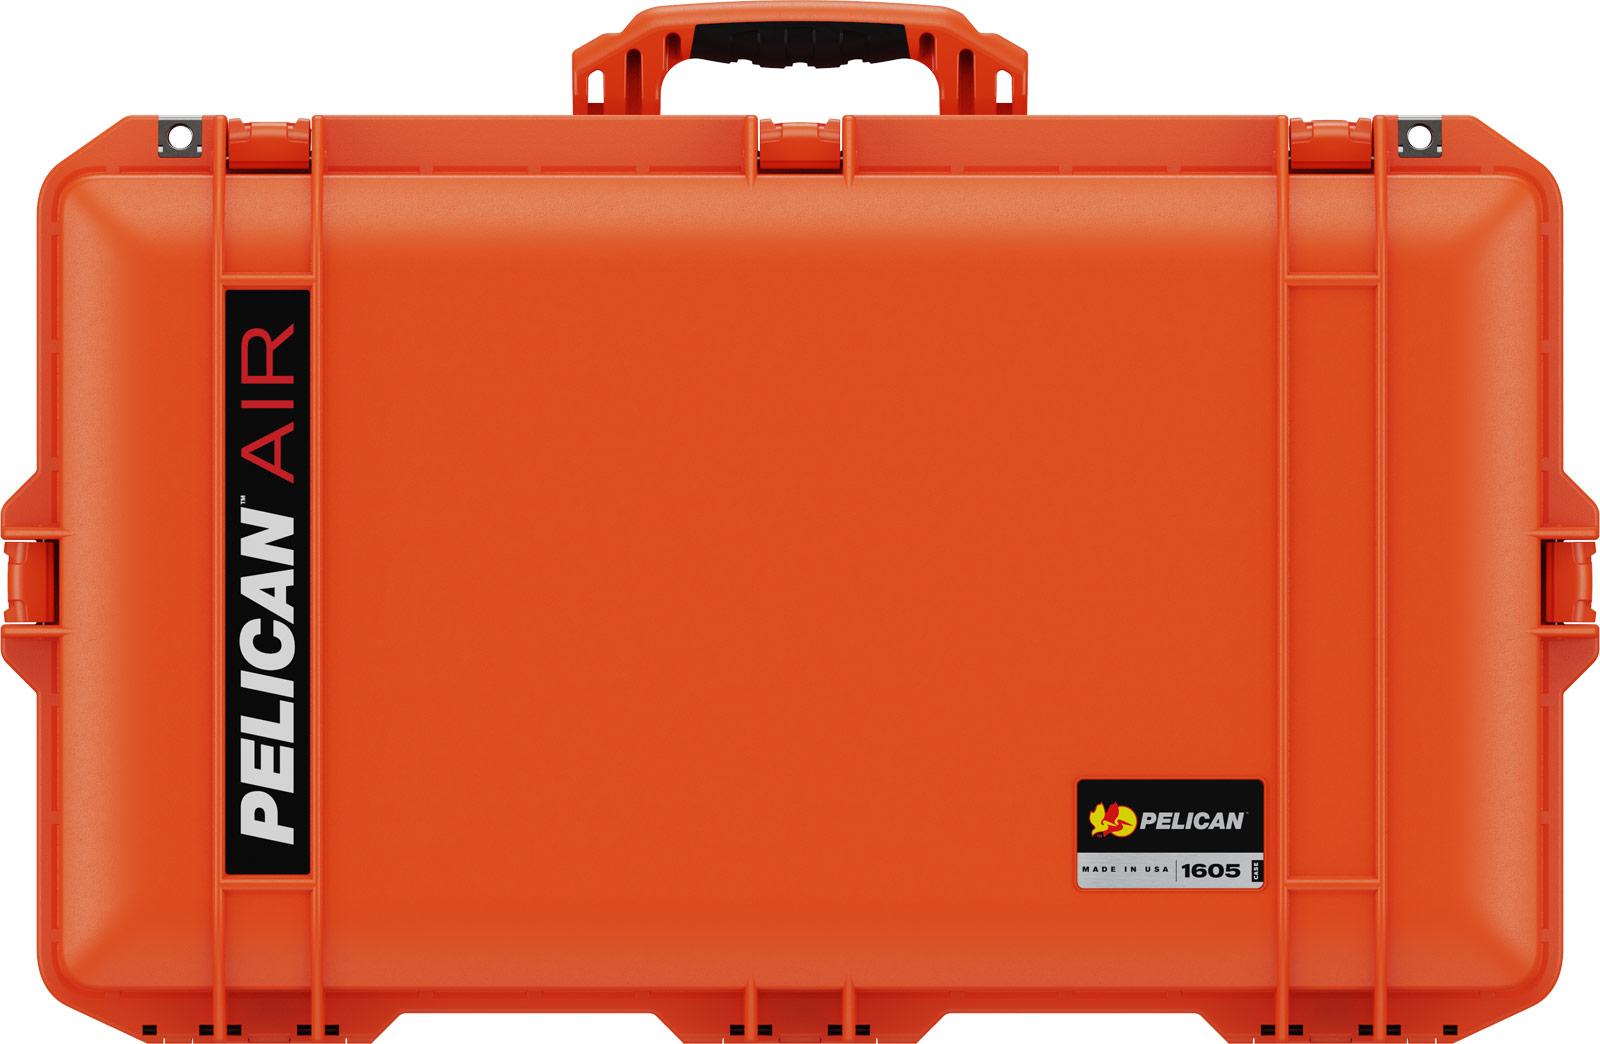 pelican orange 1605 camera dslr case